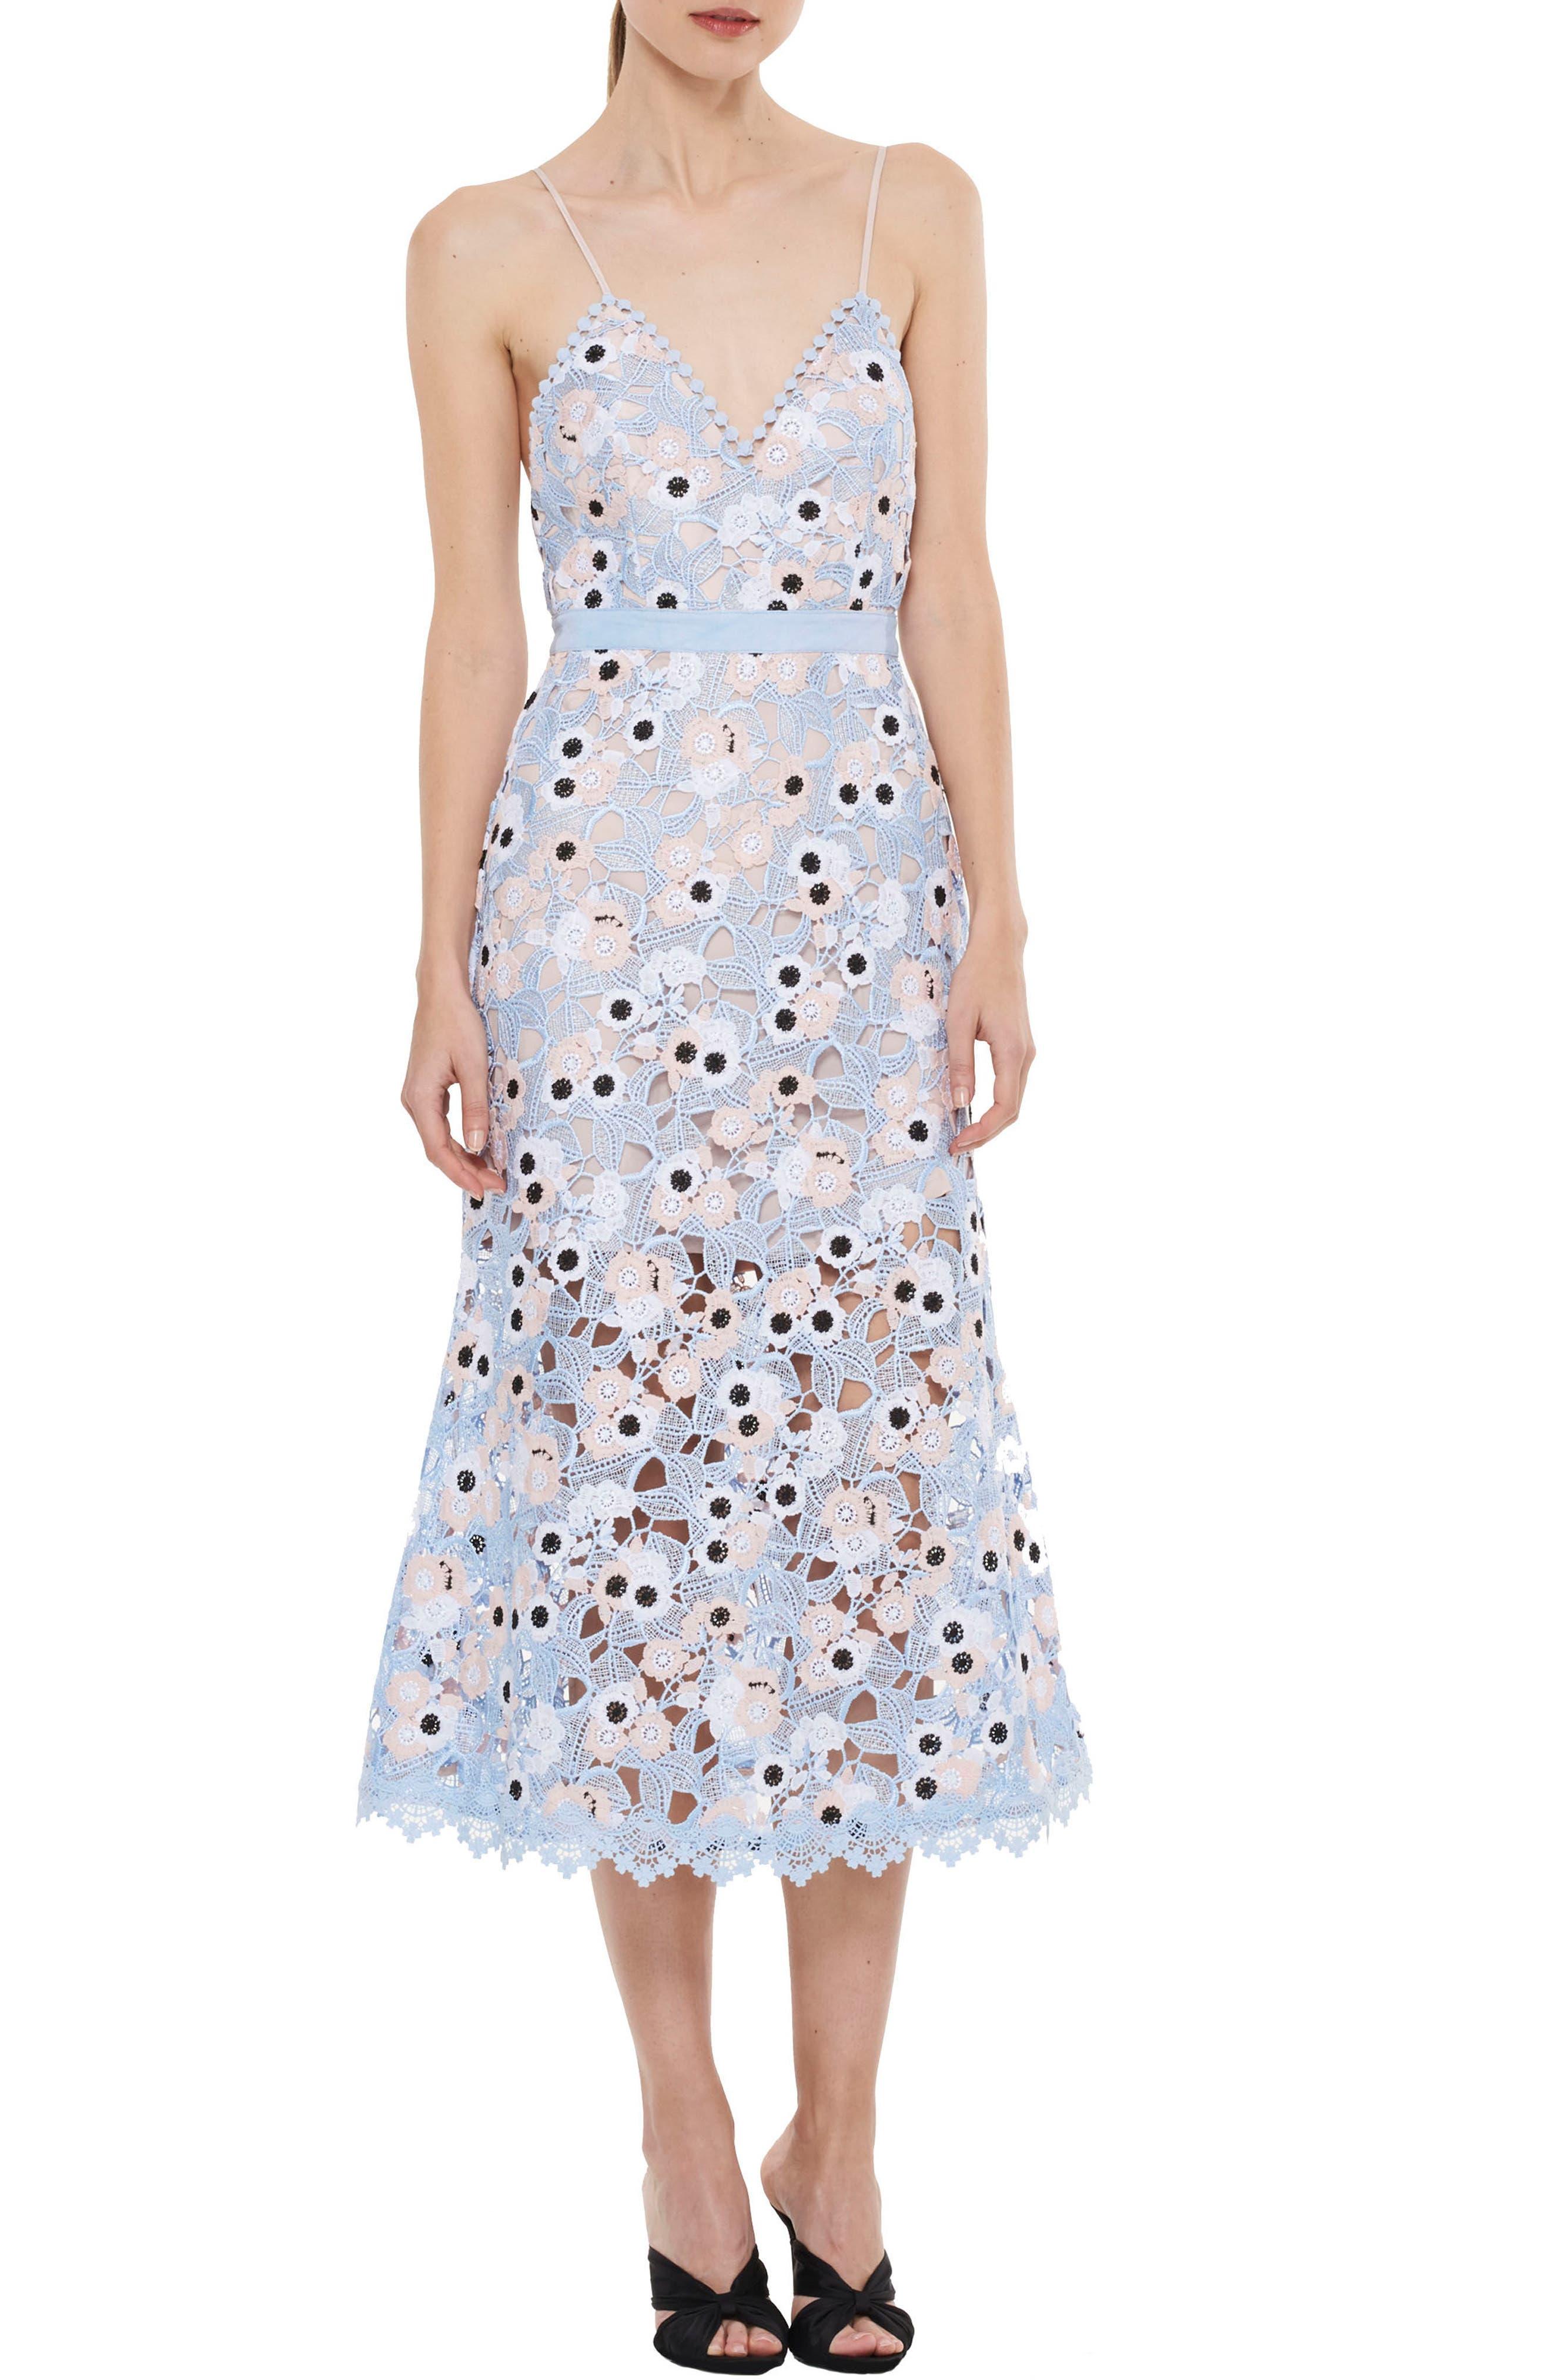 Alternate Image 1 Selected - LA MAISON TALULAH Infatuation Crochet A-Line Dress